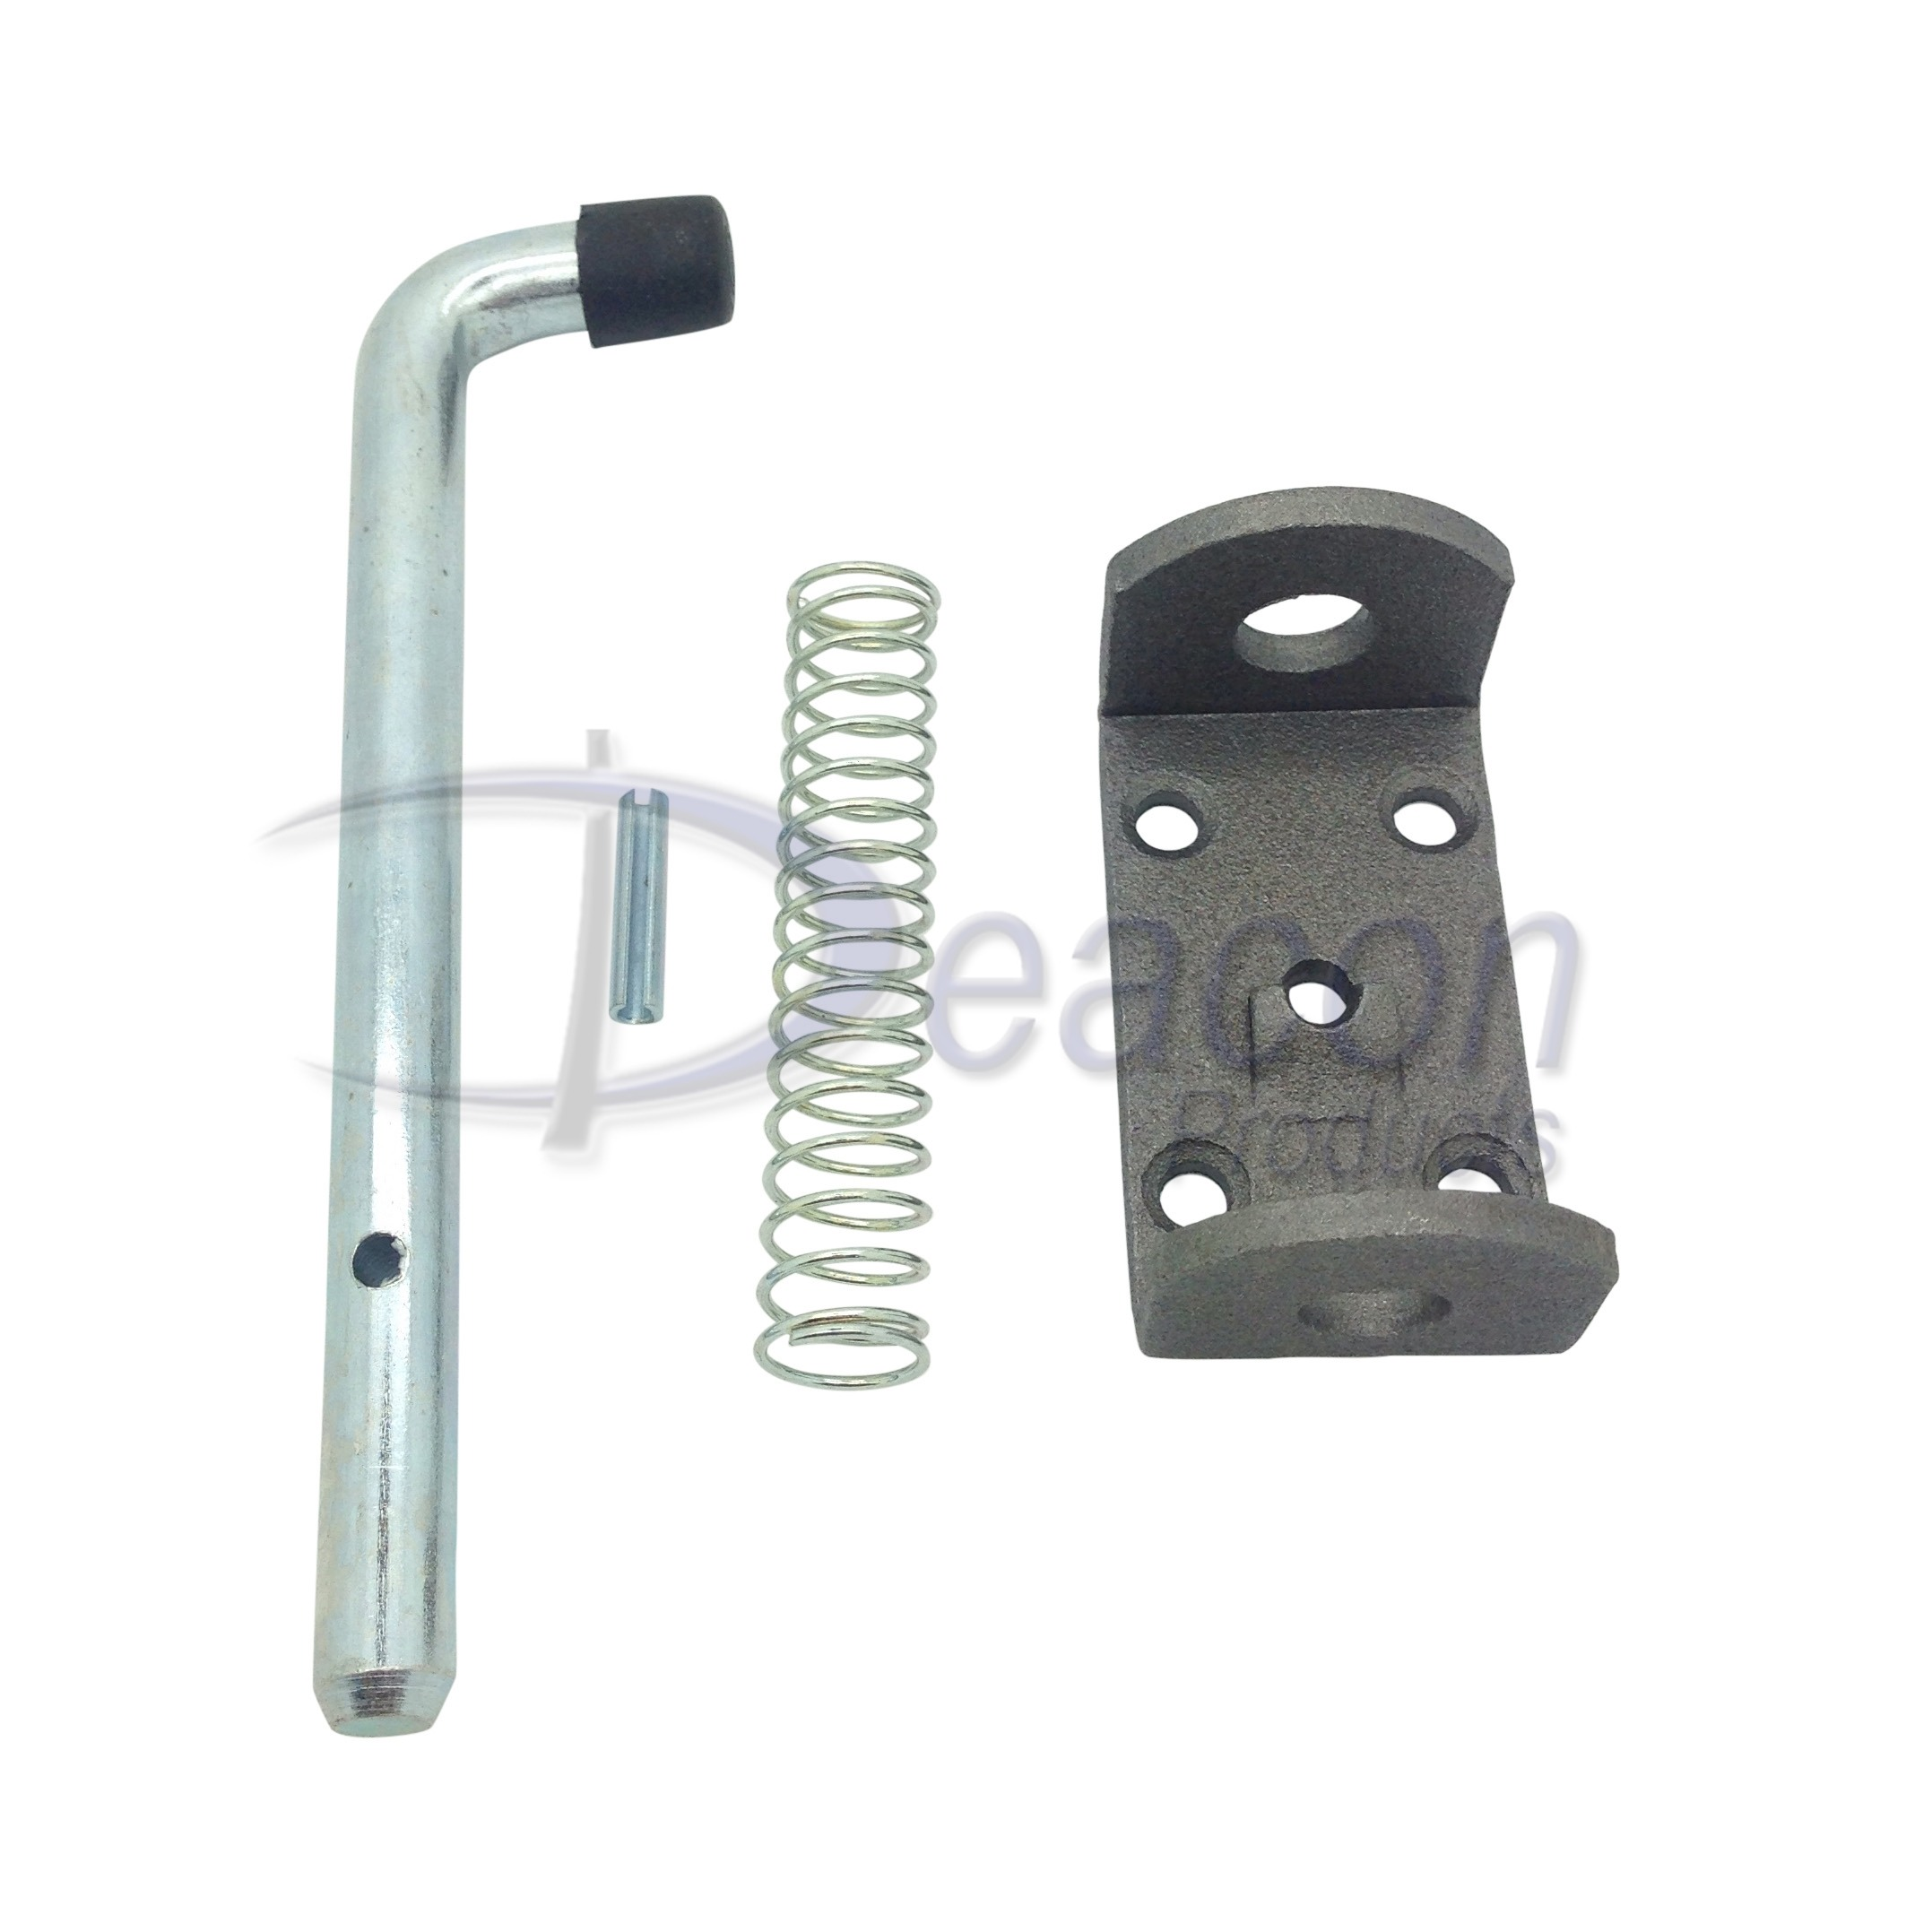 zinc-plated-spring-bolt-kit